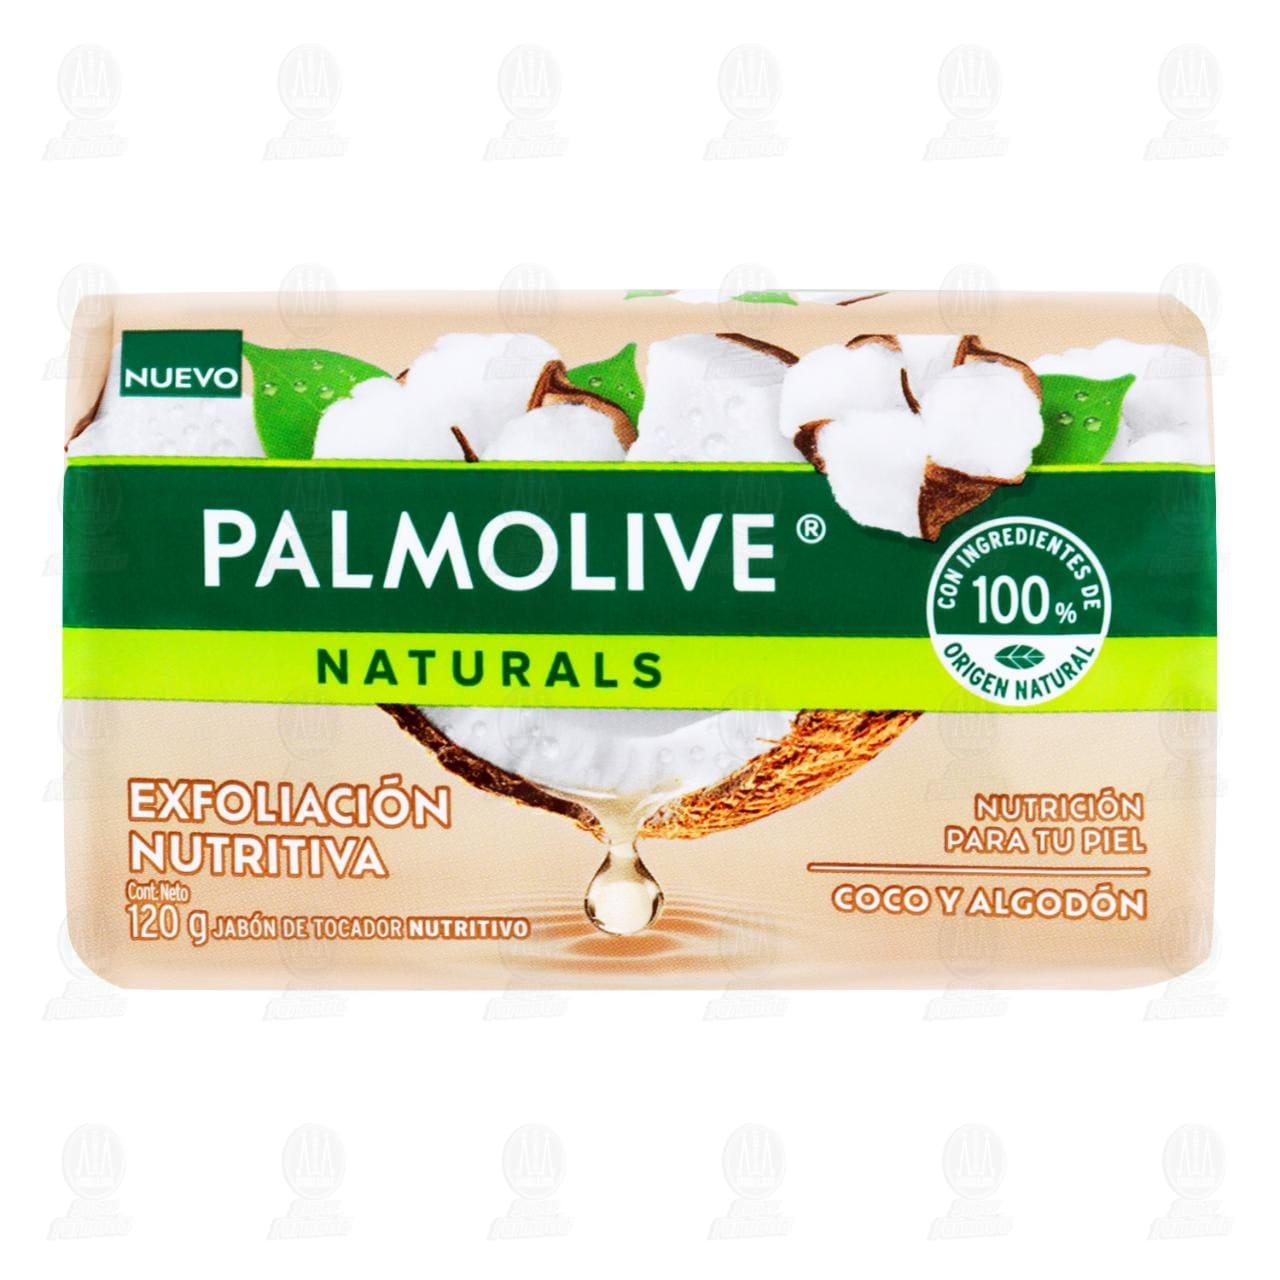 comprar https://www.movil.farmaciasguadalajara.com/wcsstore/FGCAS/wcs/products/1279378_S_1280_F.jpg en farmacias guadalajara